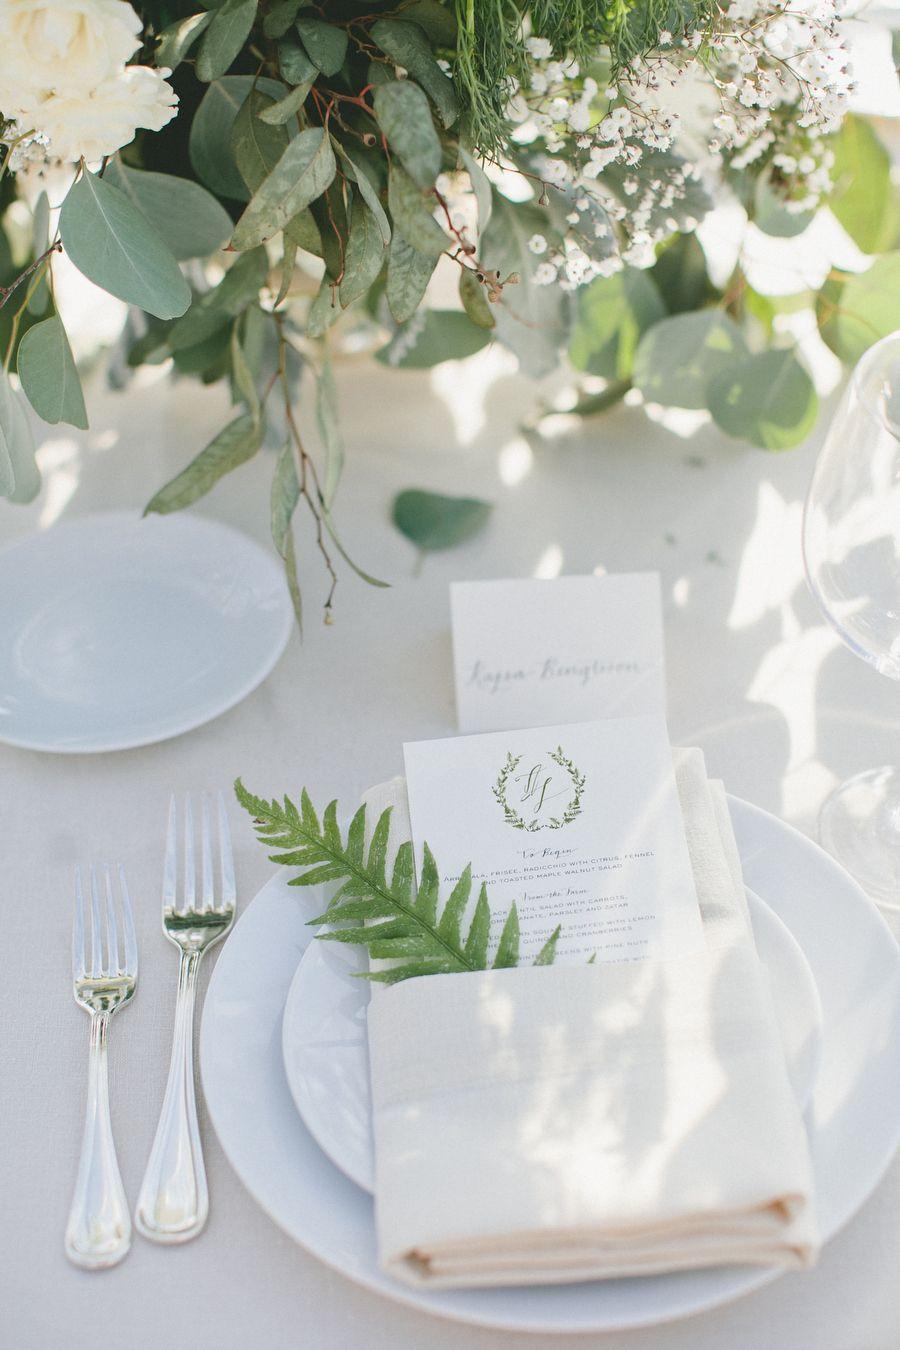 Rustic Bonny Doon Wedding with Scandinavian Traditions